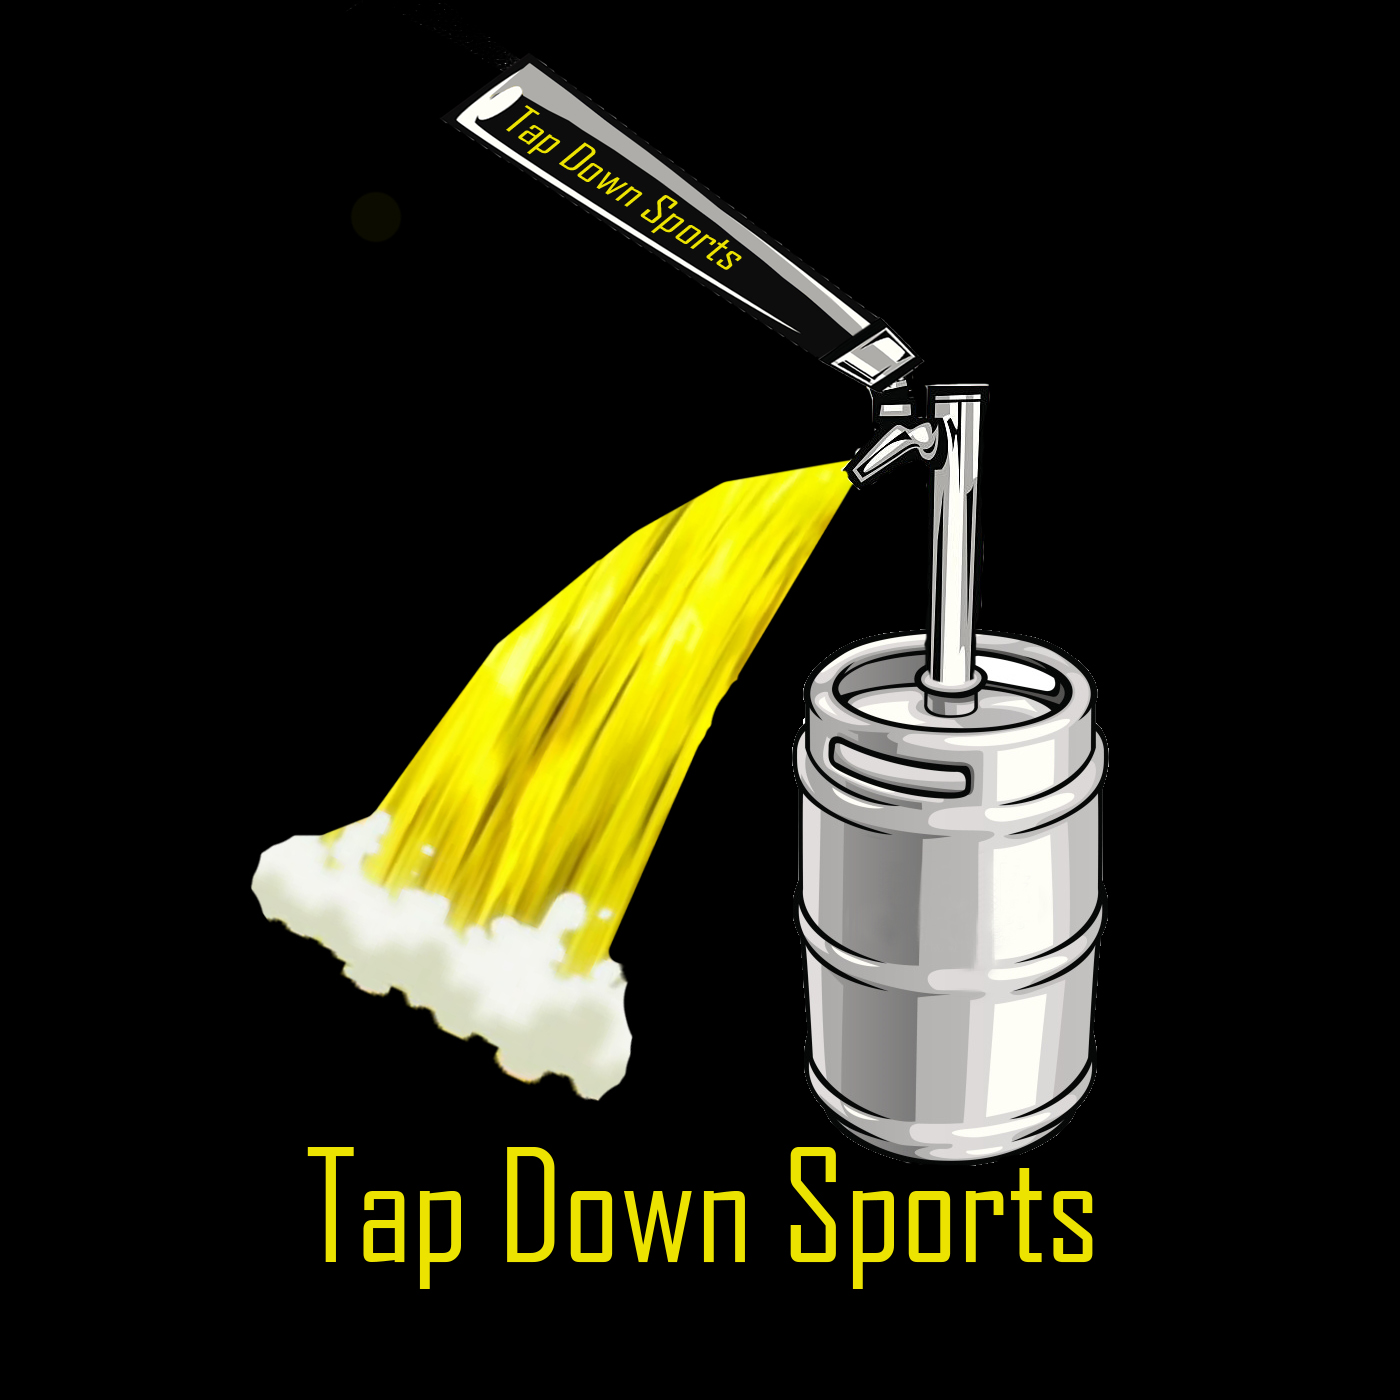 Tap Down Sports